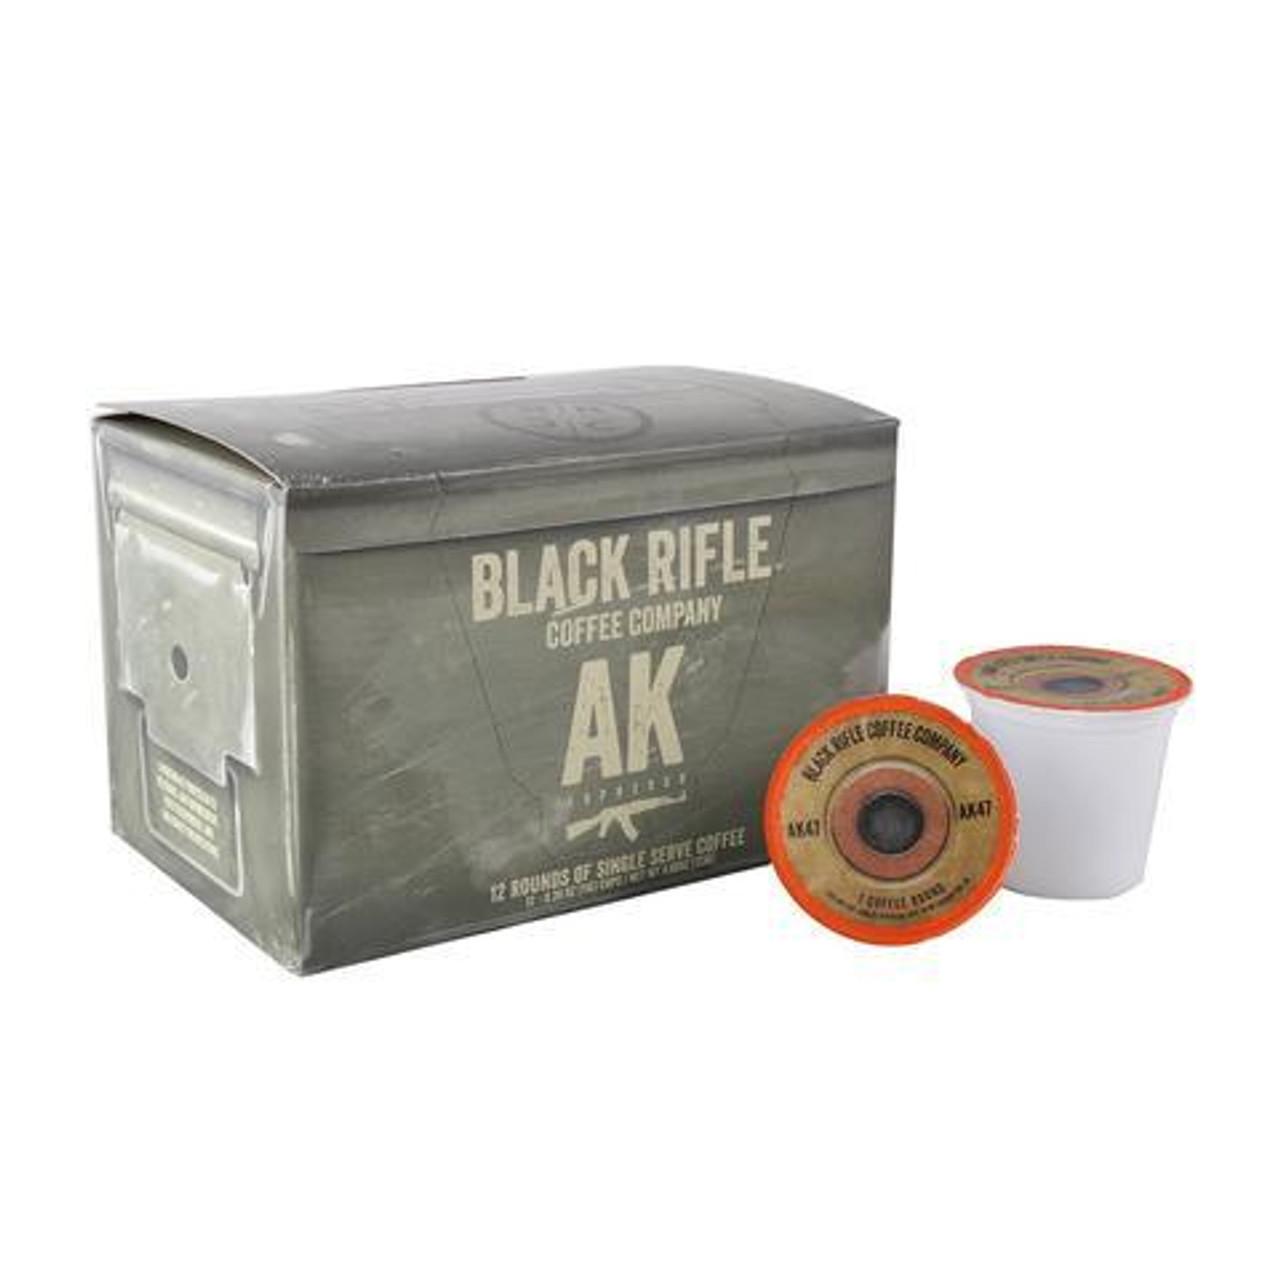 Black Rifle Coffee - AK-47 ESPRESSO COFFEE ROUNDS